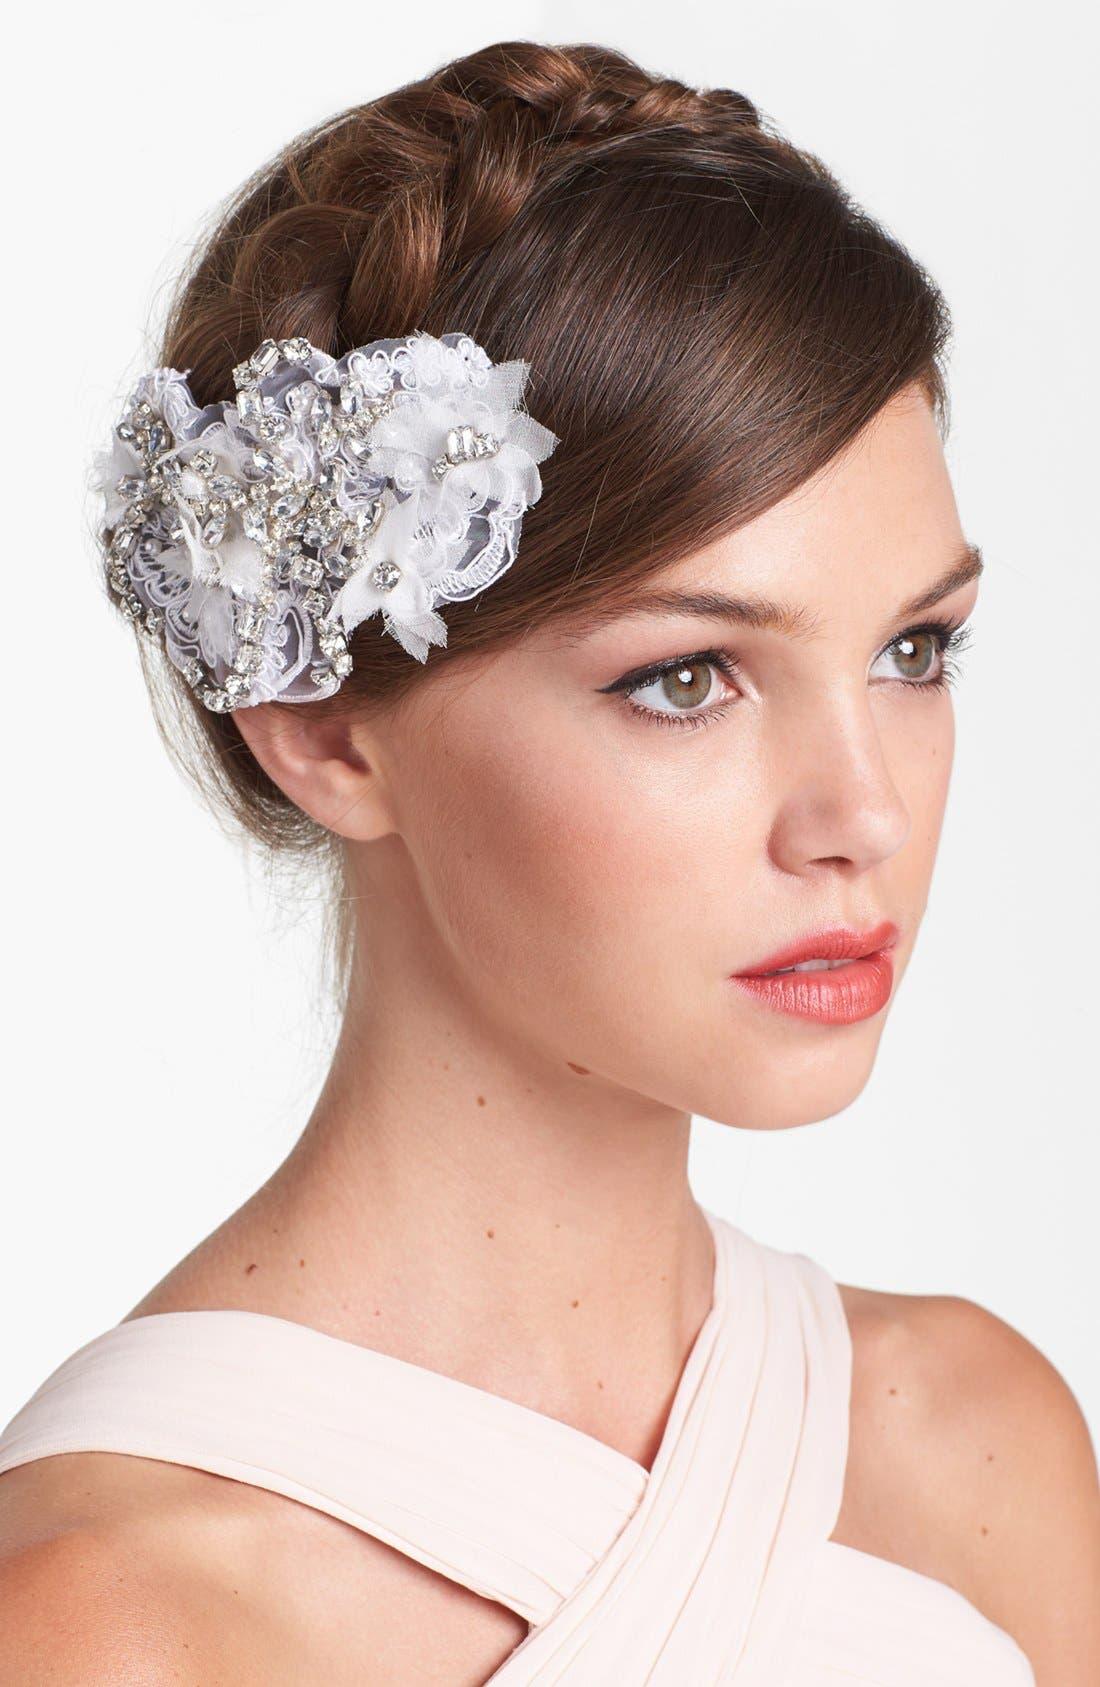 Alternate Image 1 Selected - Serephine 'Eloise' Rhinestone & Lace Bridal Comb